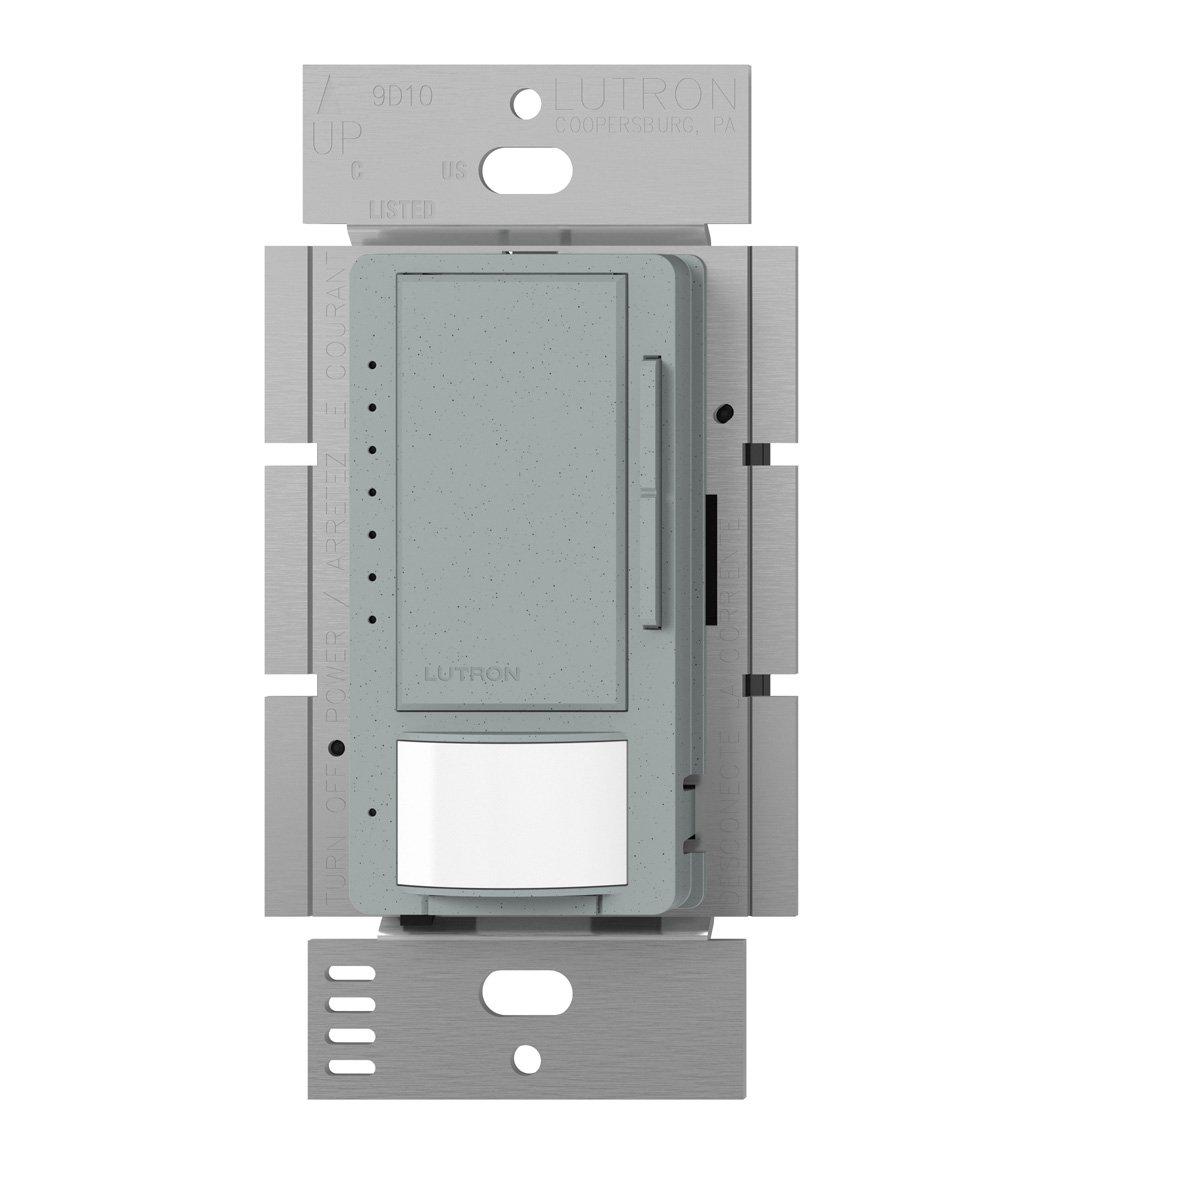 Lutron Maestro CL単極/ multi-location Vacancy Sensingディマー MSCL-VP153M-BG 1 B00FQL1R32 ブルーストーン ブルーストーン